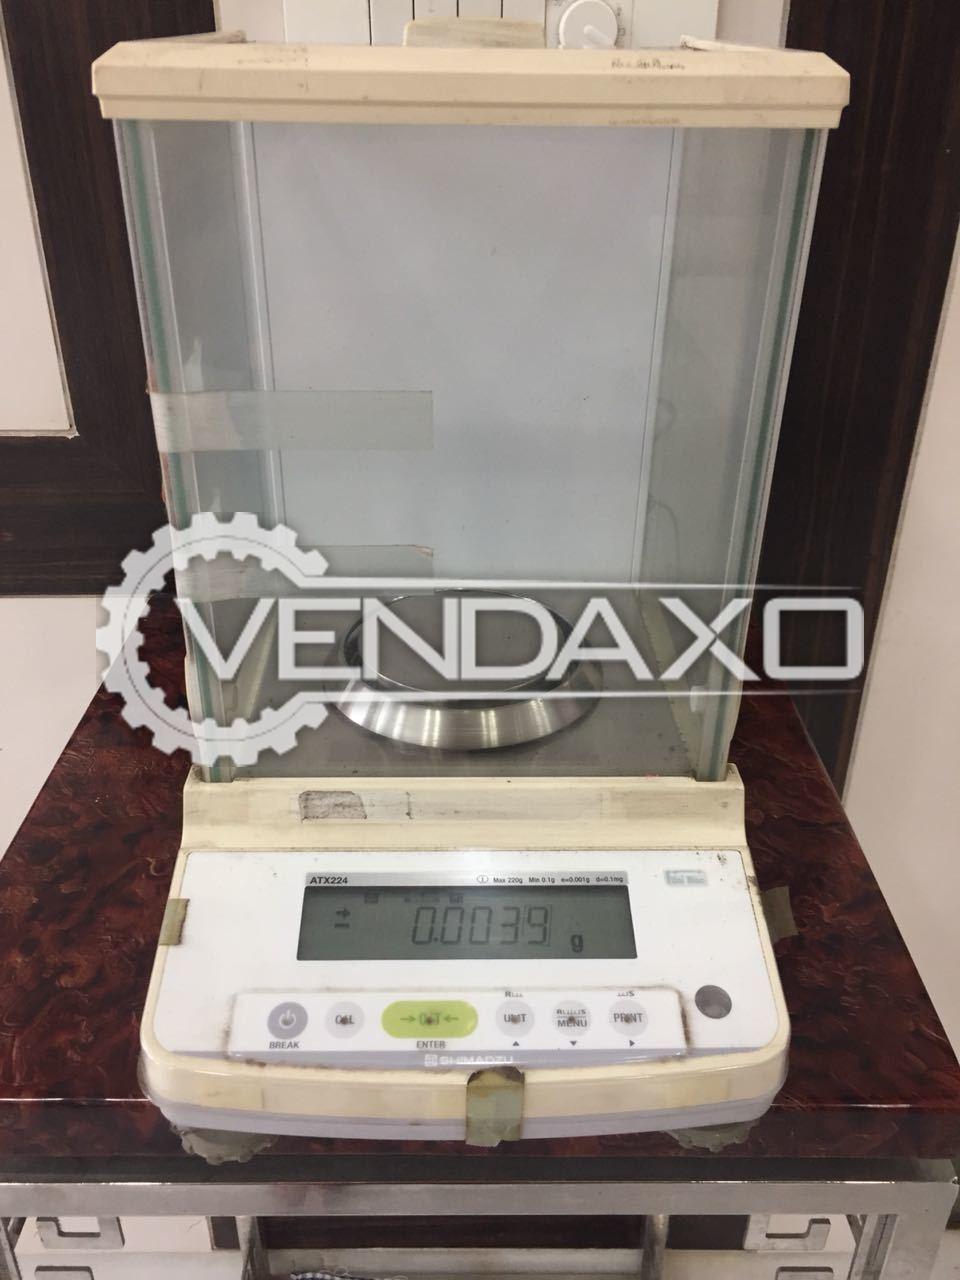 Shimadzu ATX 224 Analytical Balance - 220 Gram